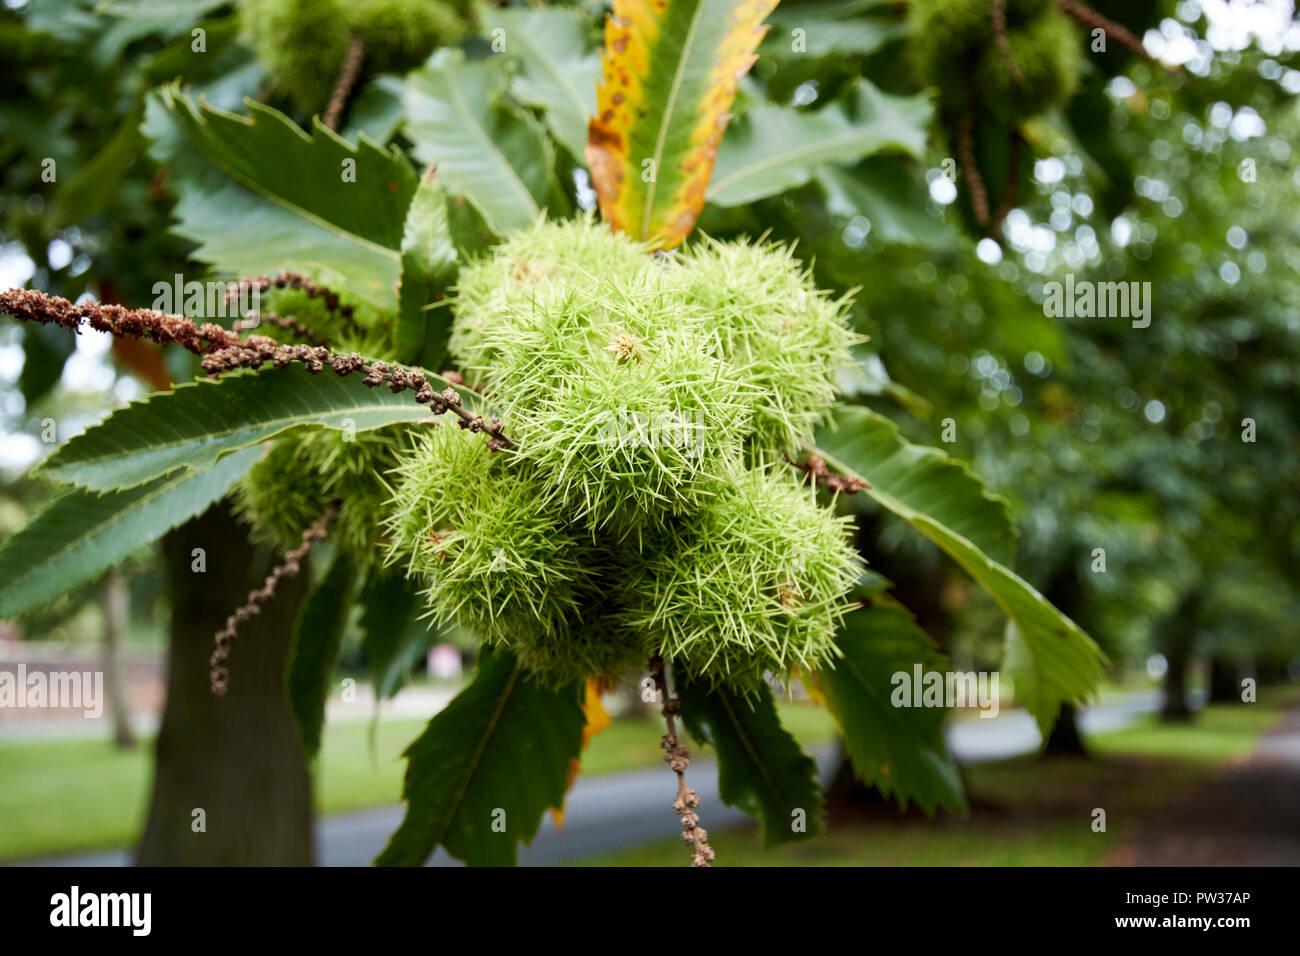 sweet chestnut tree with nutshells and leaves Liverpool Merseyside England UK Stock Photo